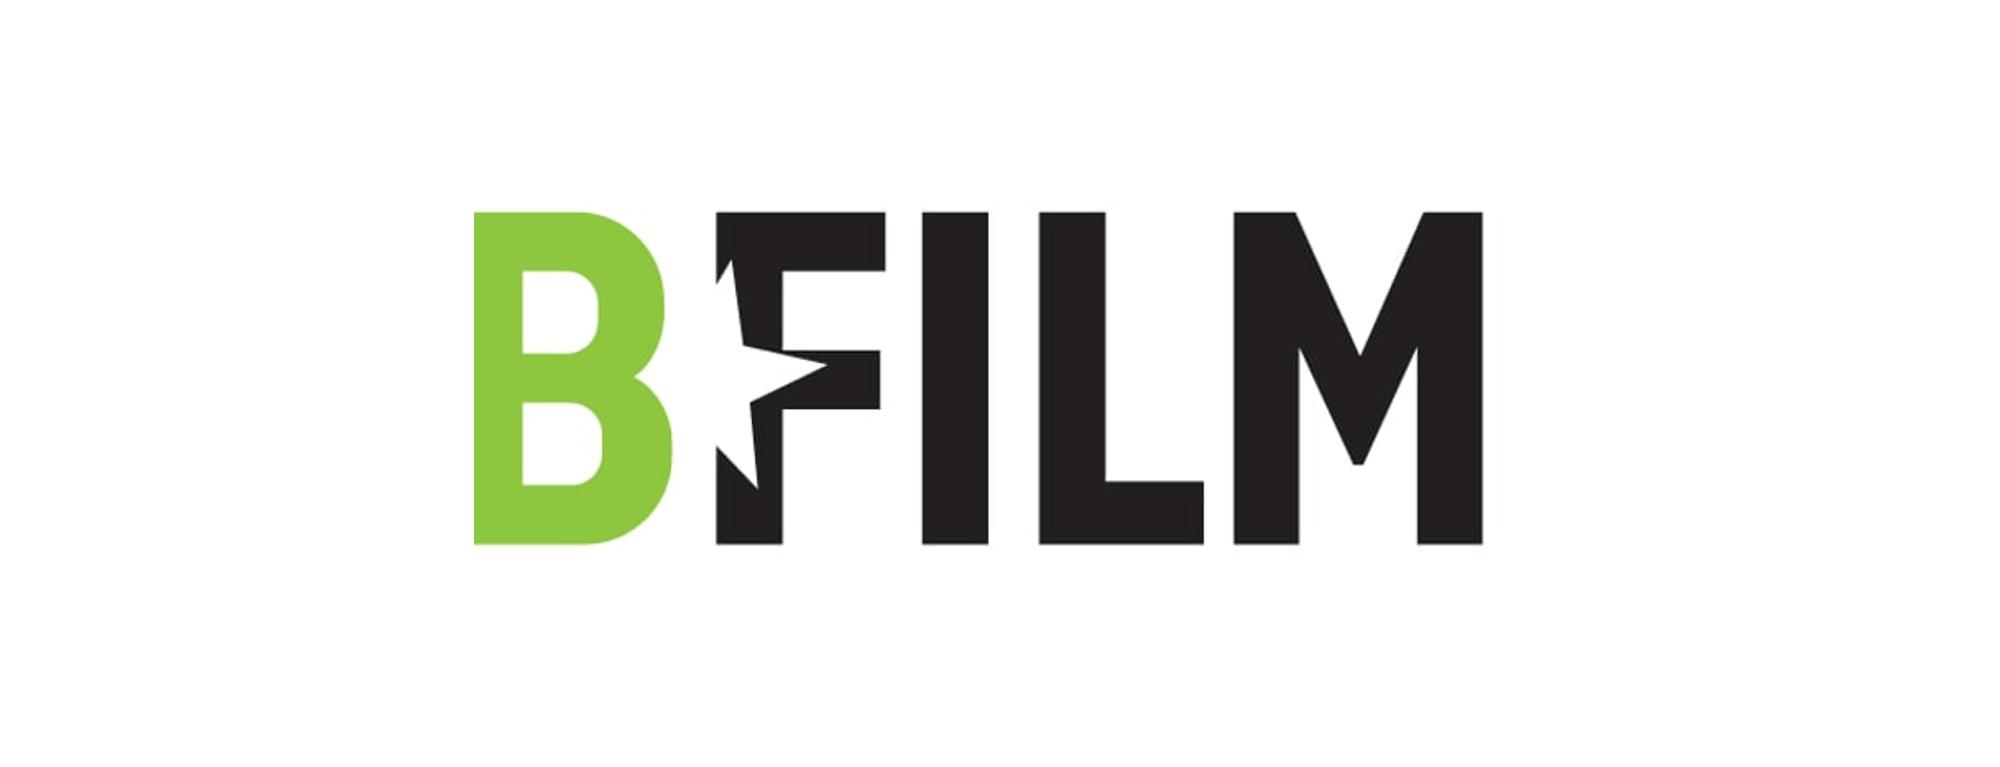 klient-wooacademy-bfilm-logo